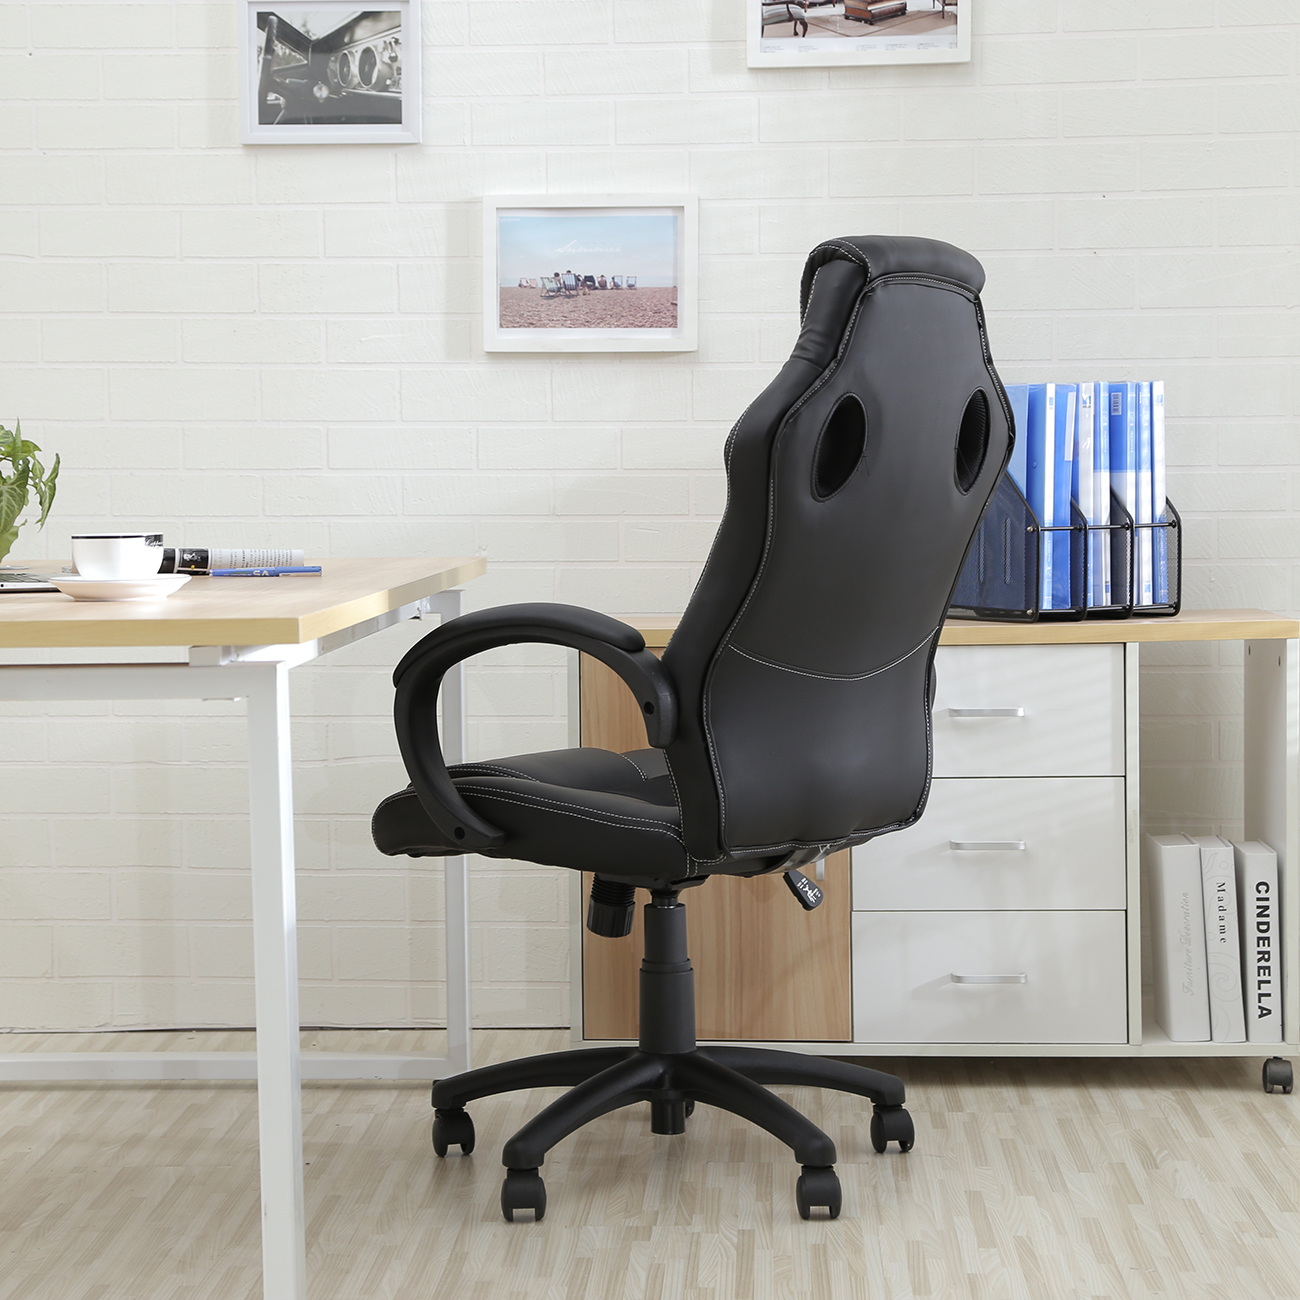 office chair ergonomic computer mesh pu leather desk seat race car styled racing ebay. Black Bedroom Furniture Sets. Home Design Ideas